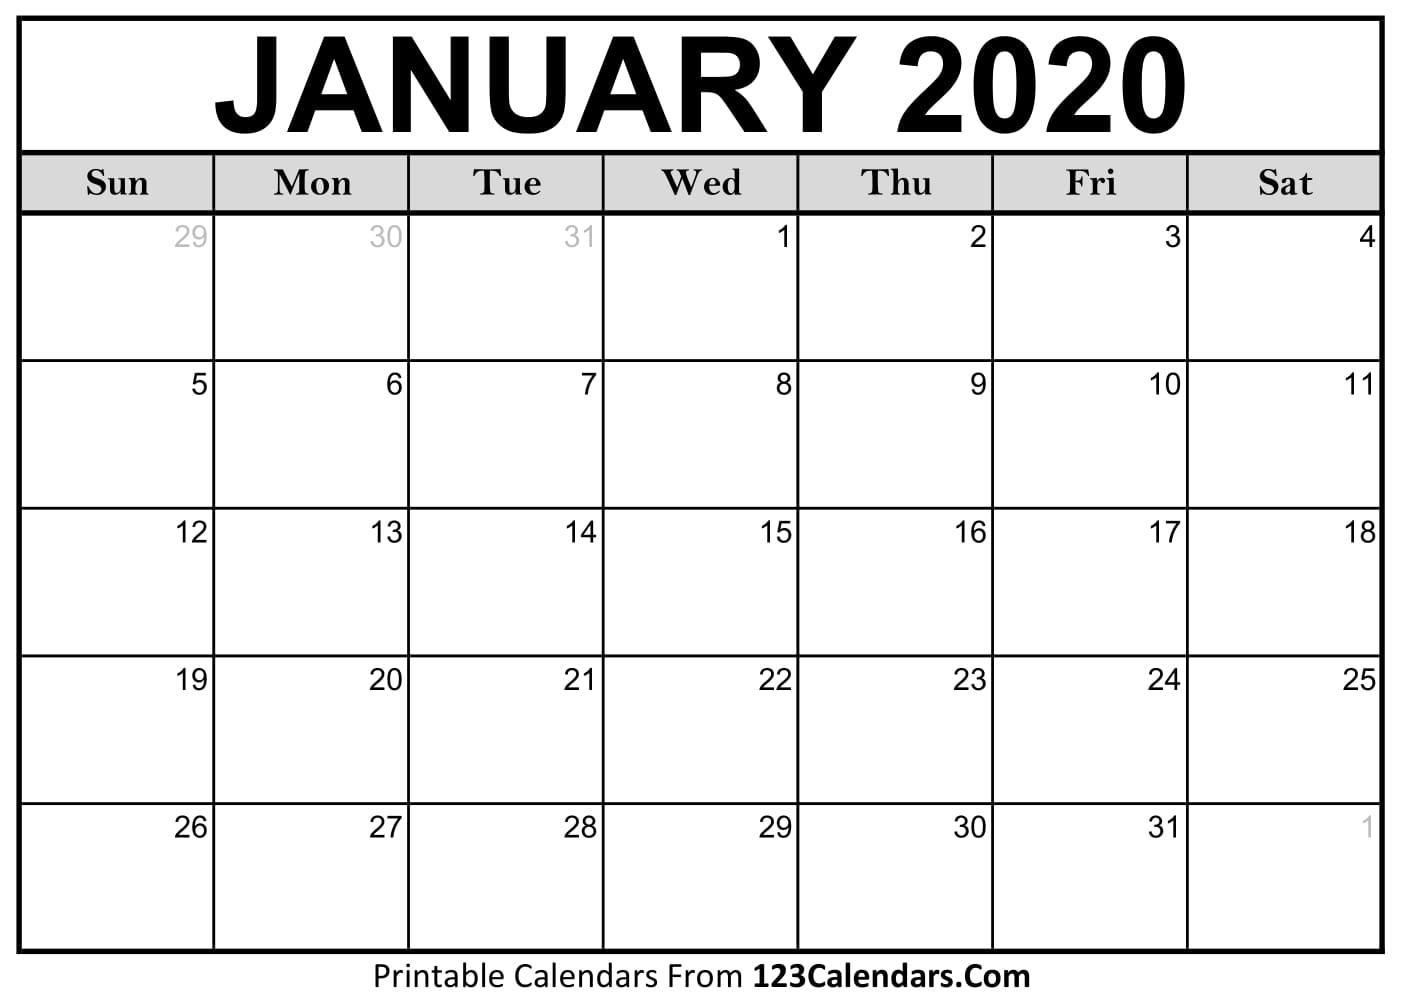 January 2020 Printable Calendar | 123Calendars for National Day Calendar 2020 Printable